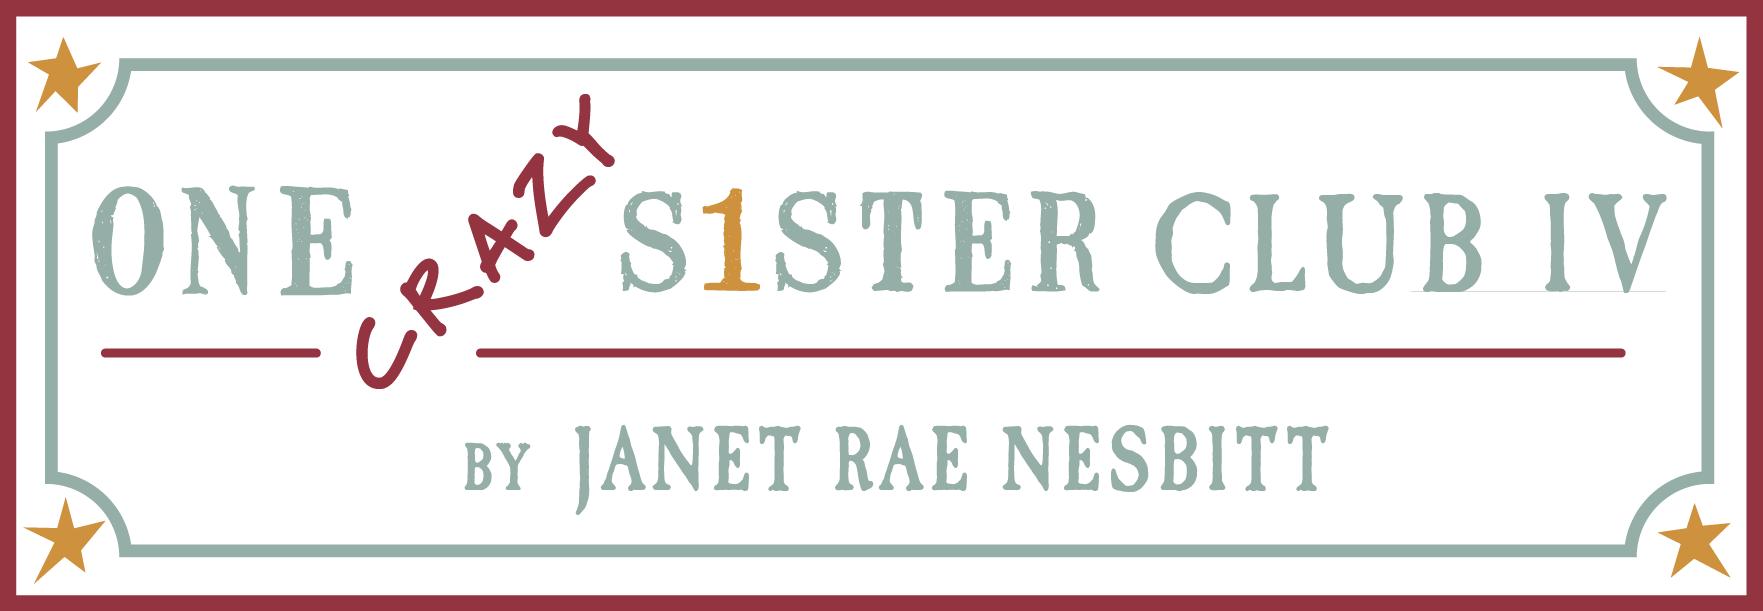 crazy-sister-club-logo.png